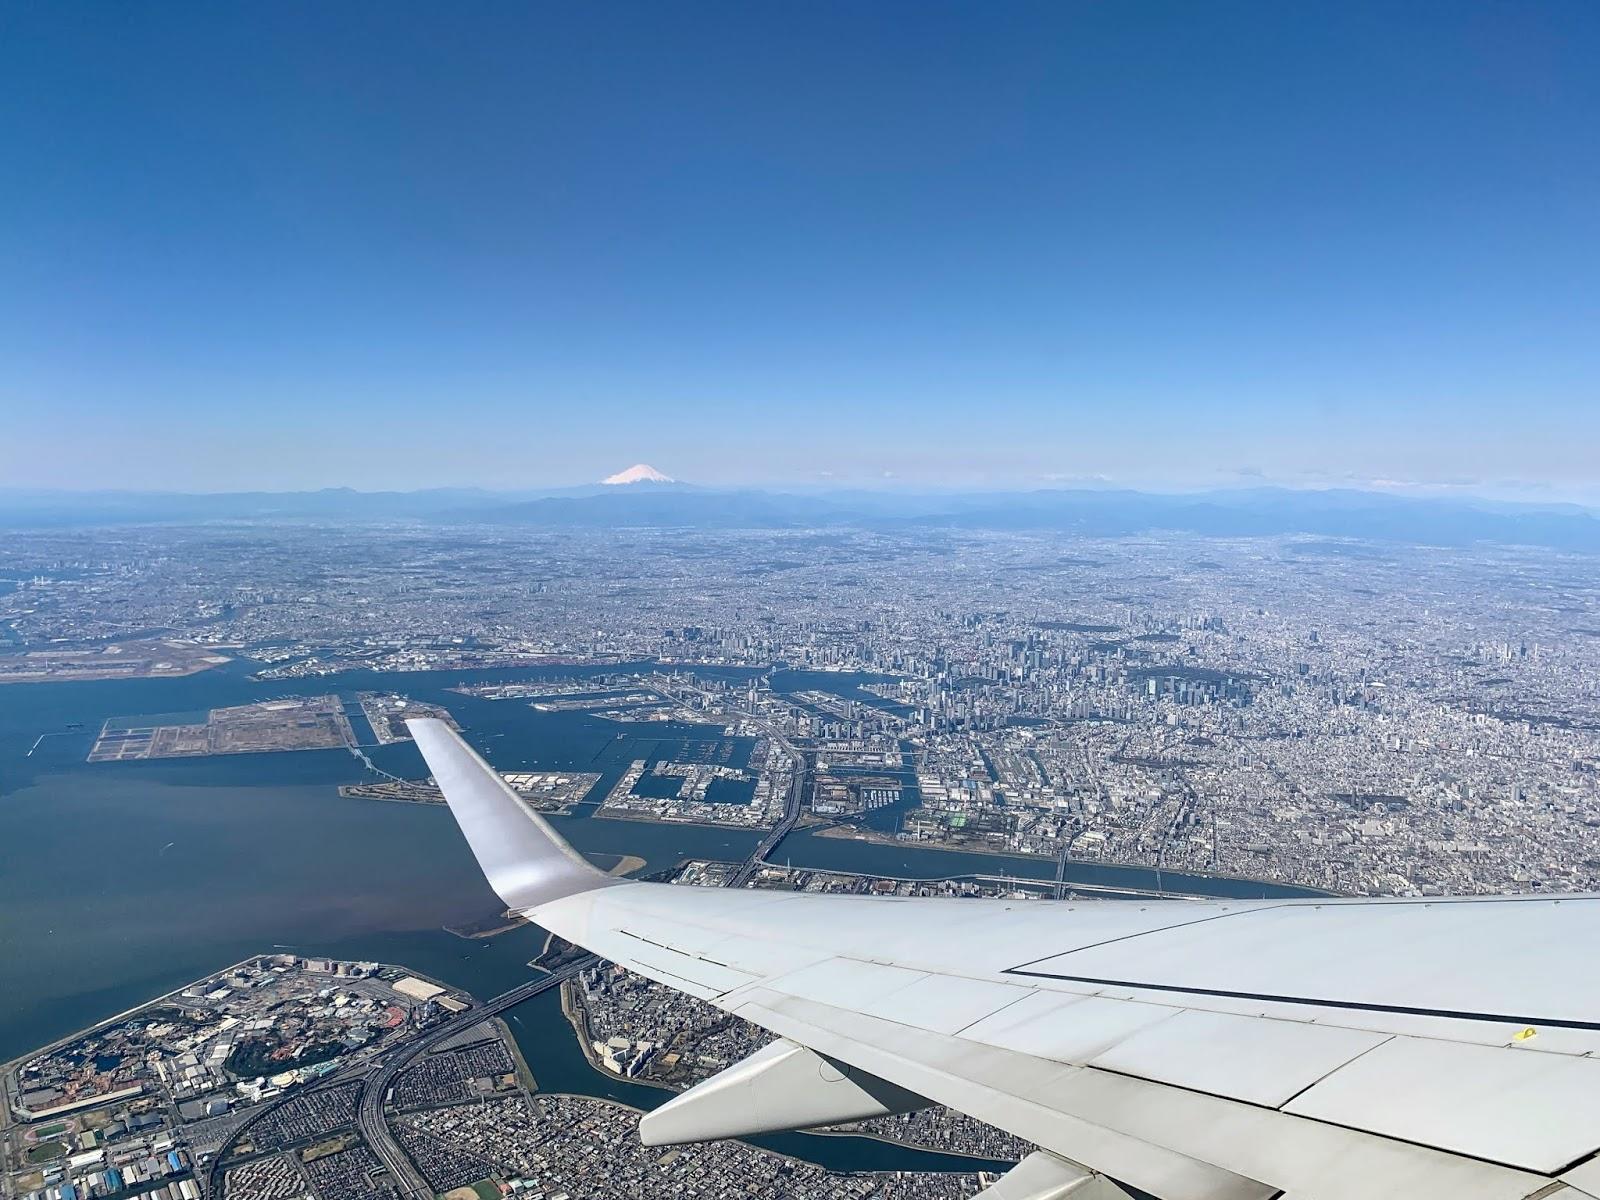 Tokyo with Mt.Fuji